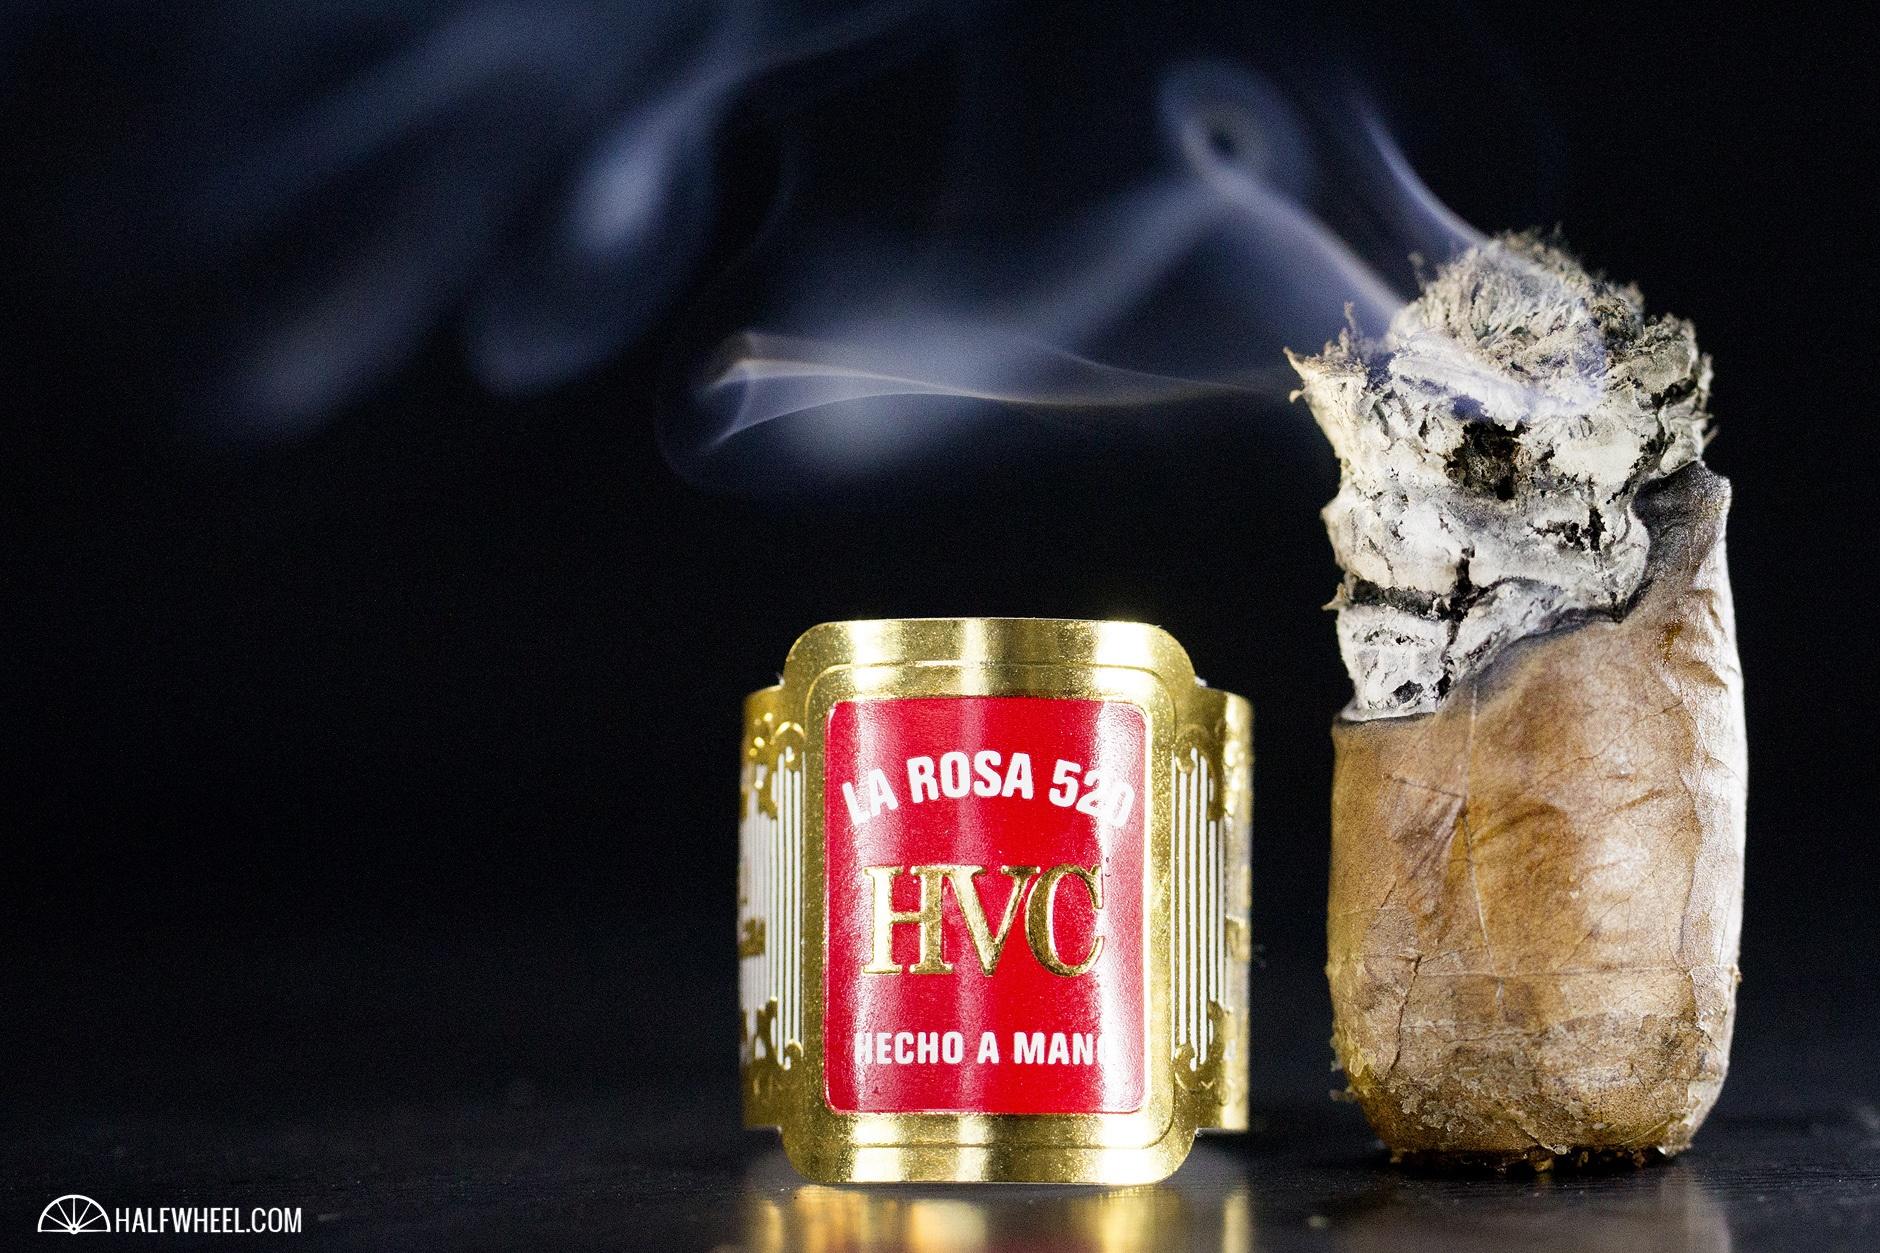 hvc-la-rosa-520-reyes-4